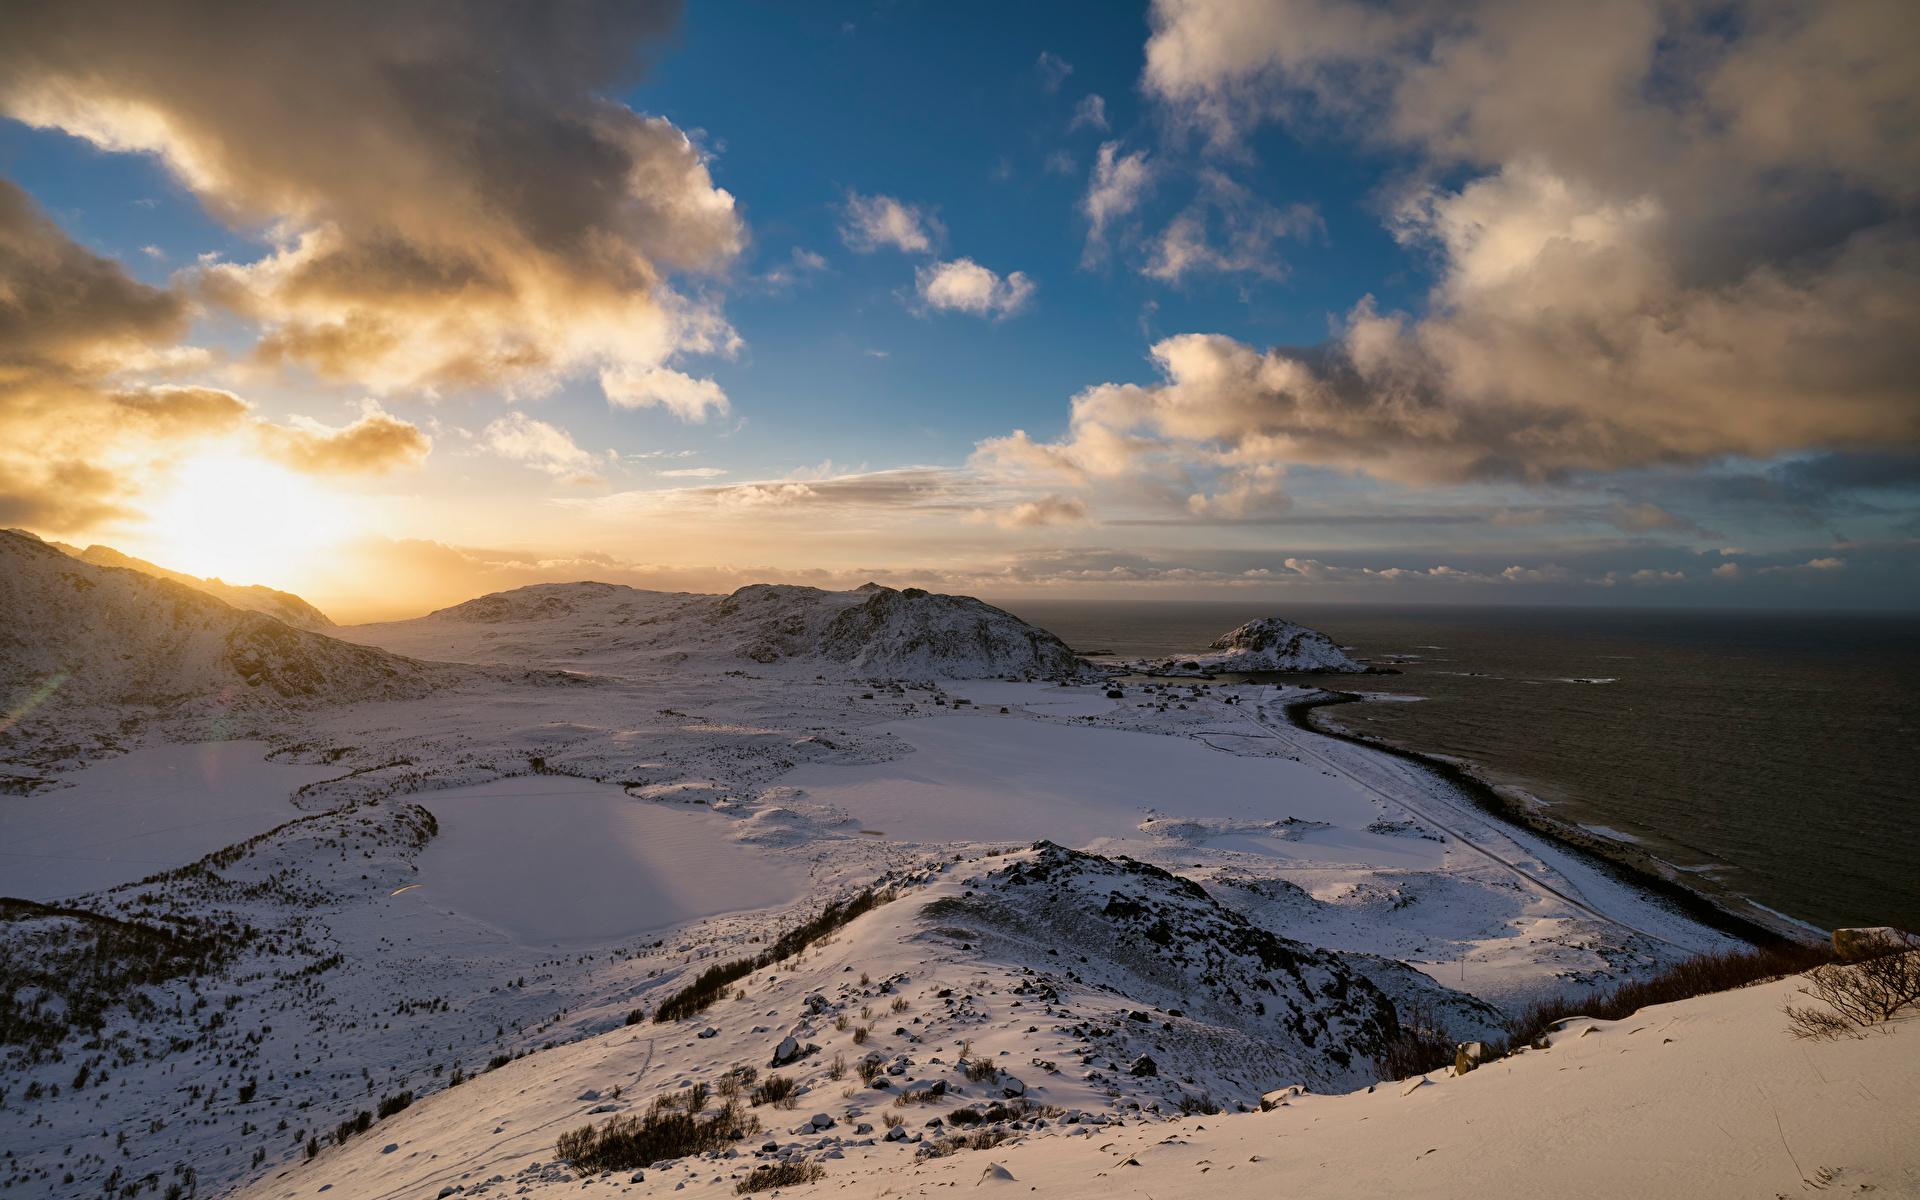 Bilder Lofoten Norwegen Berg Natur Küste Wolke 1920x1200 Gebirge